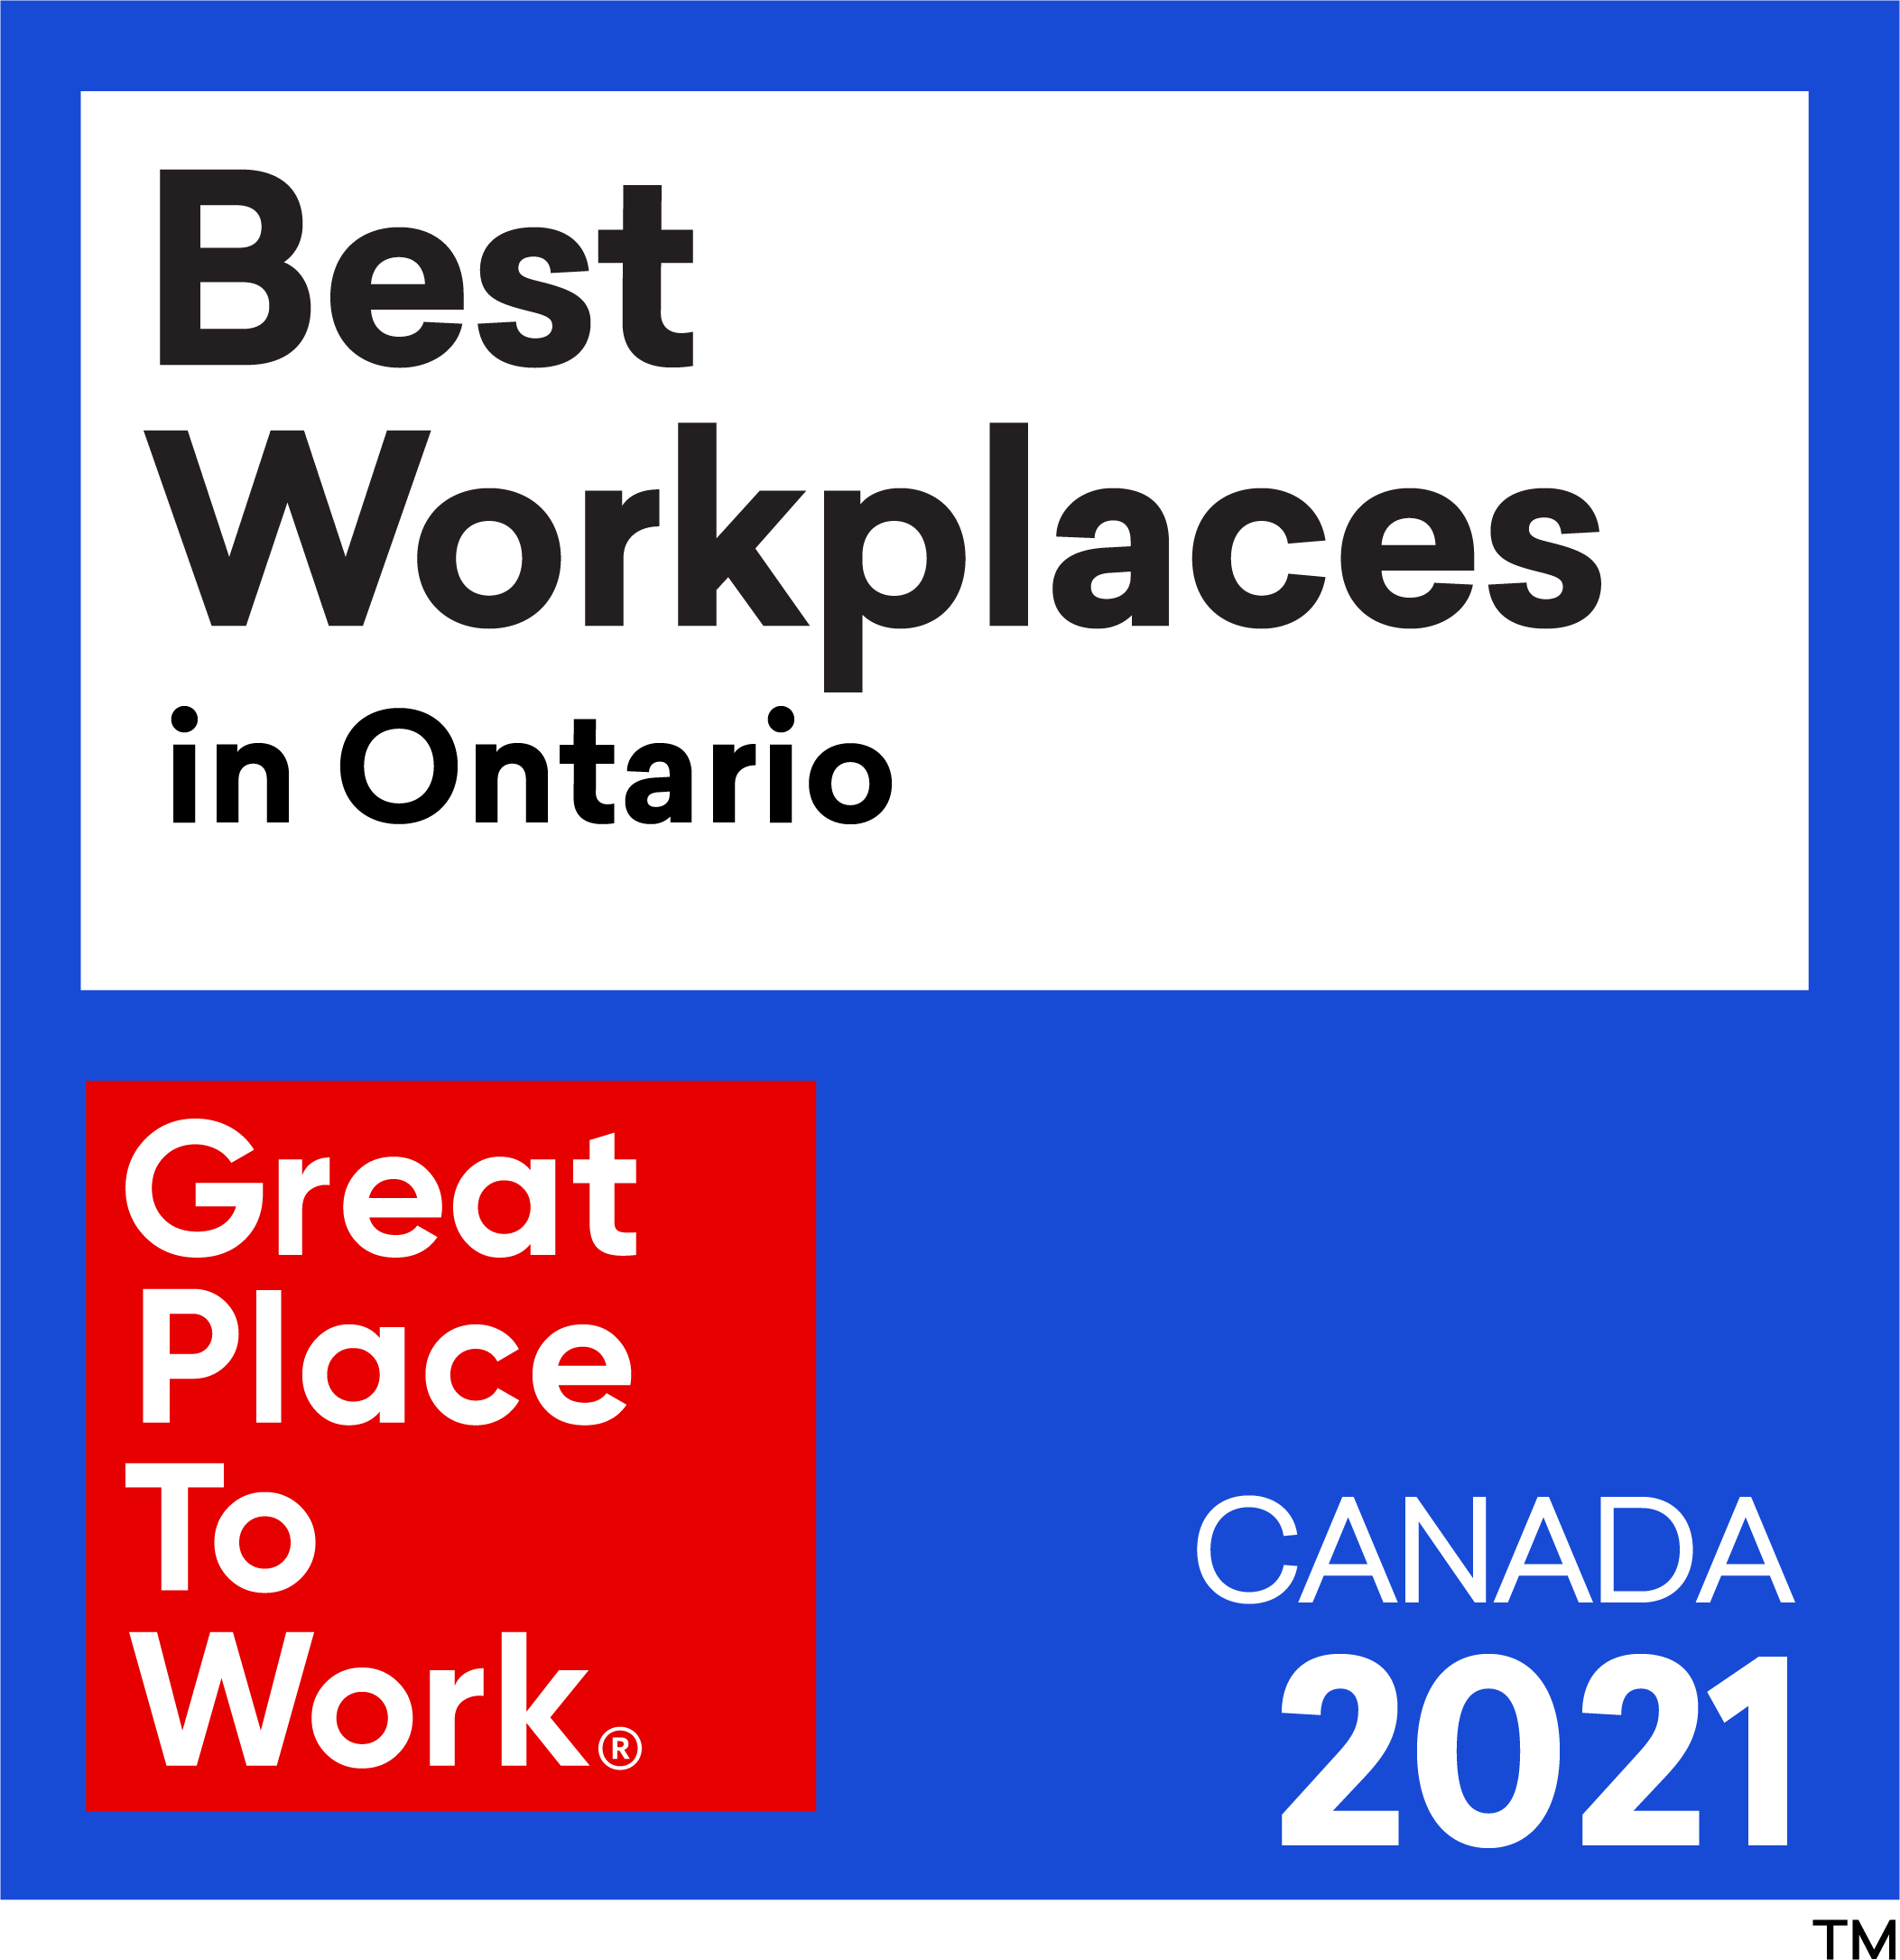 Best_Workplaces in Ontario 2021